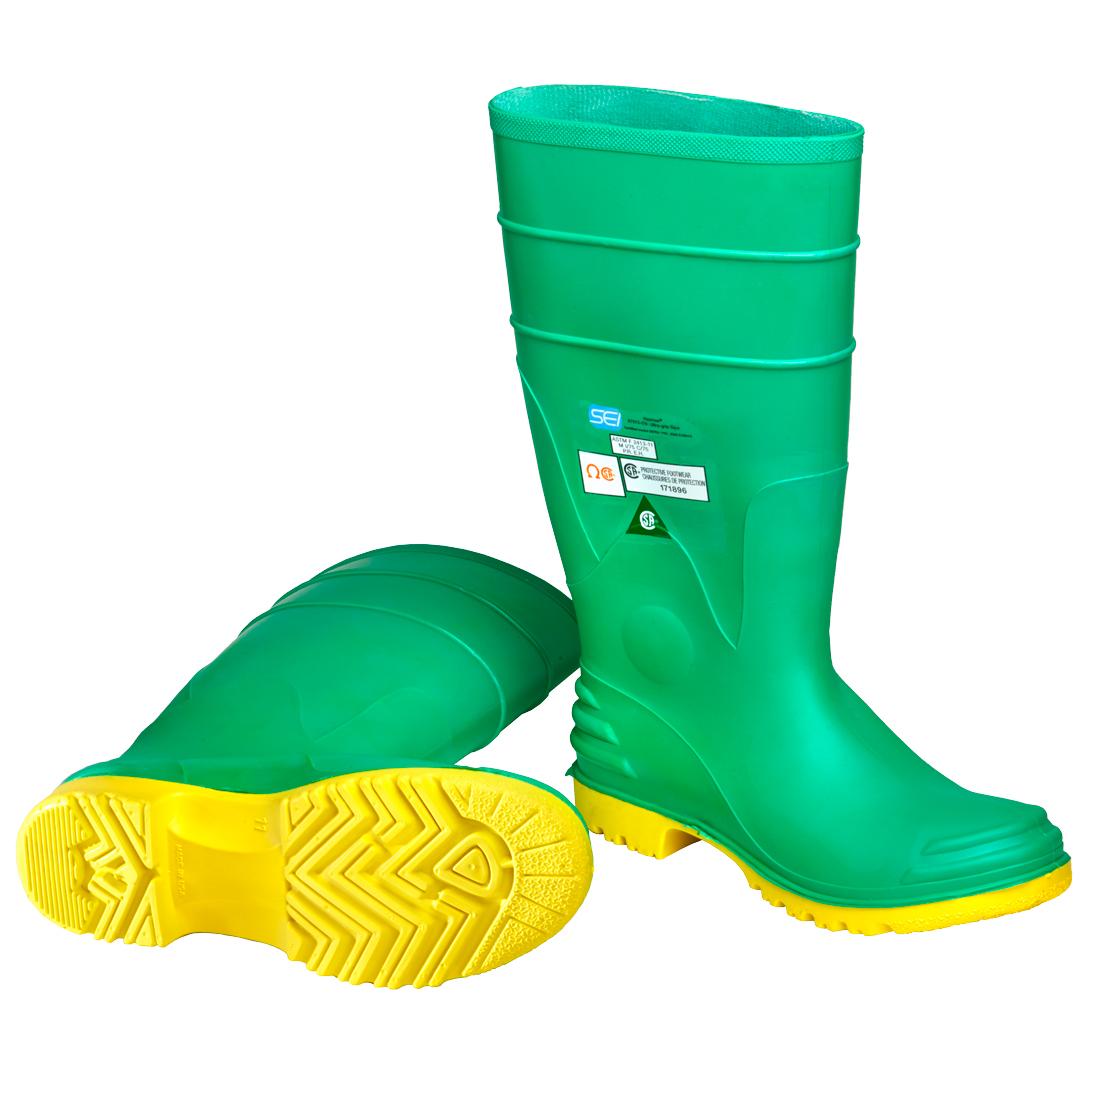 Onguard Hazmax Knee Boots image